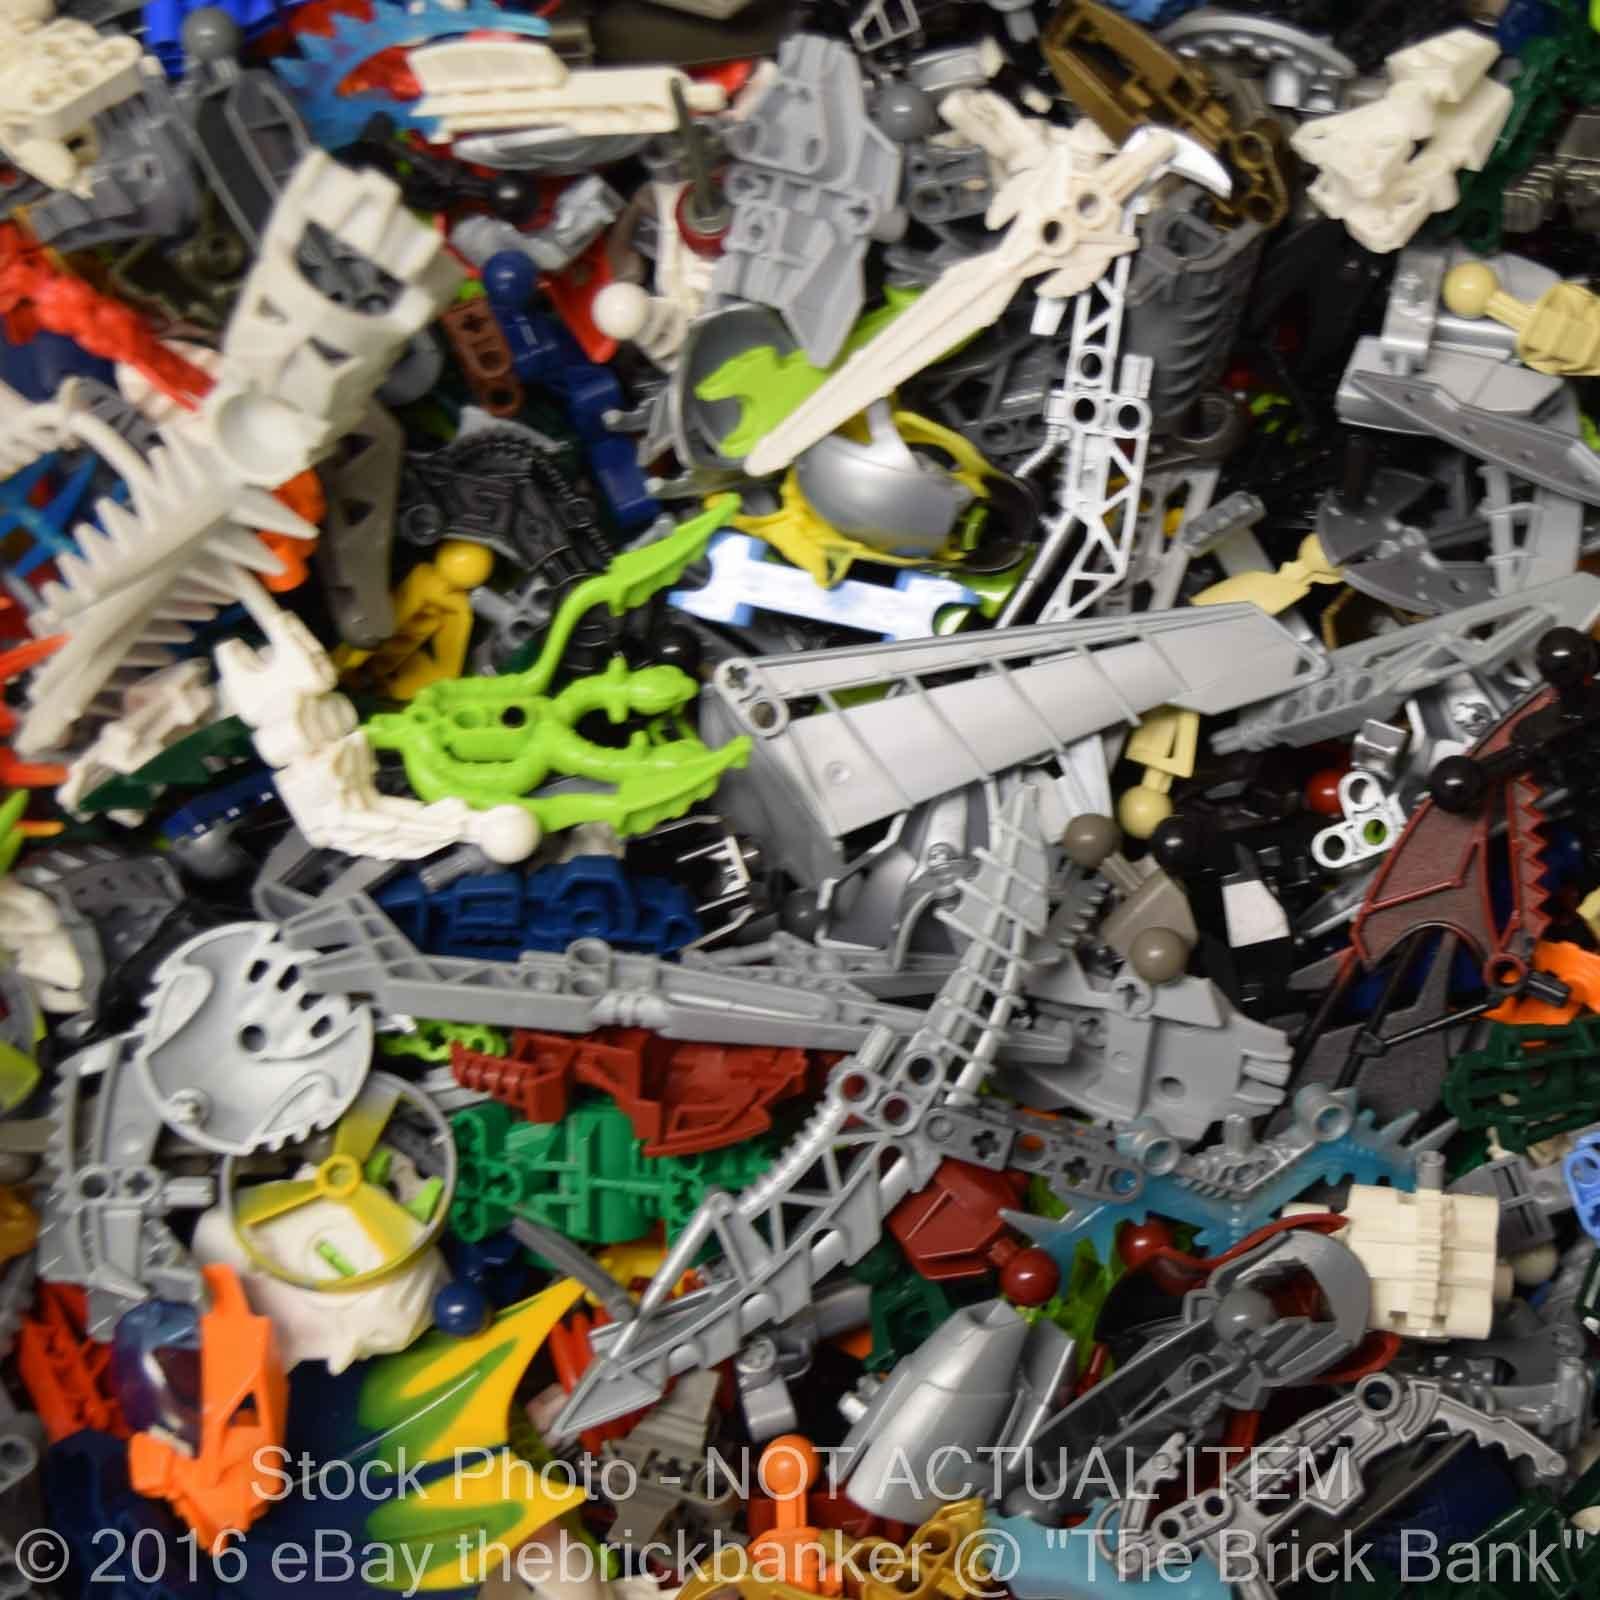 You Pick Parts Authentic LEGO Bulk Lot Bricks Pieces HUGE Variety 1-5 lbs